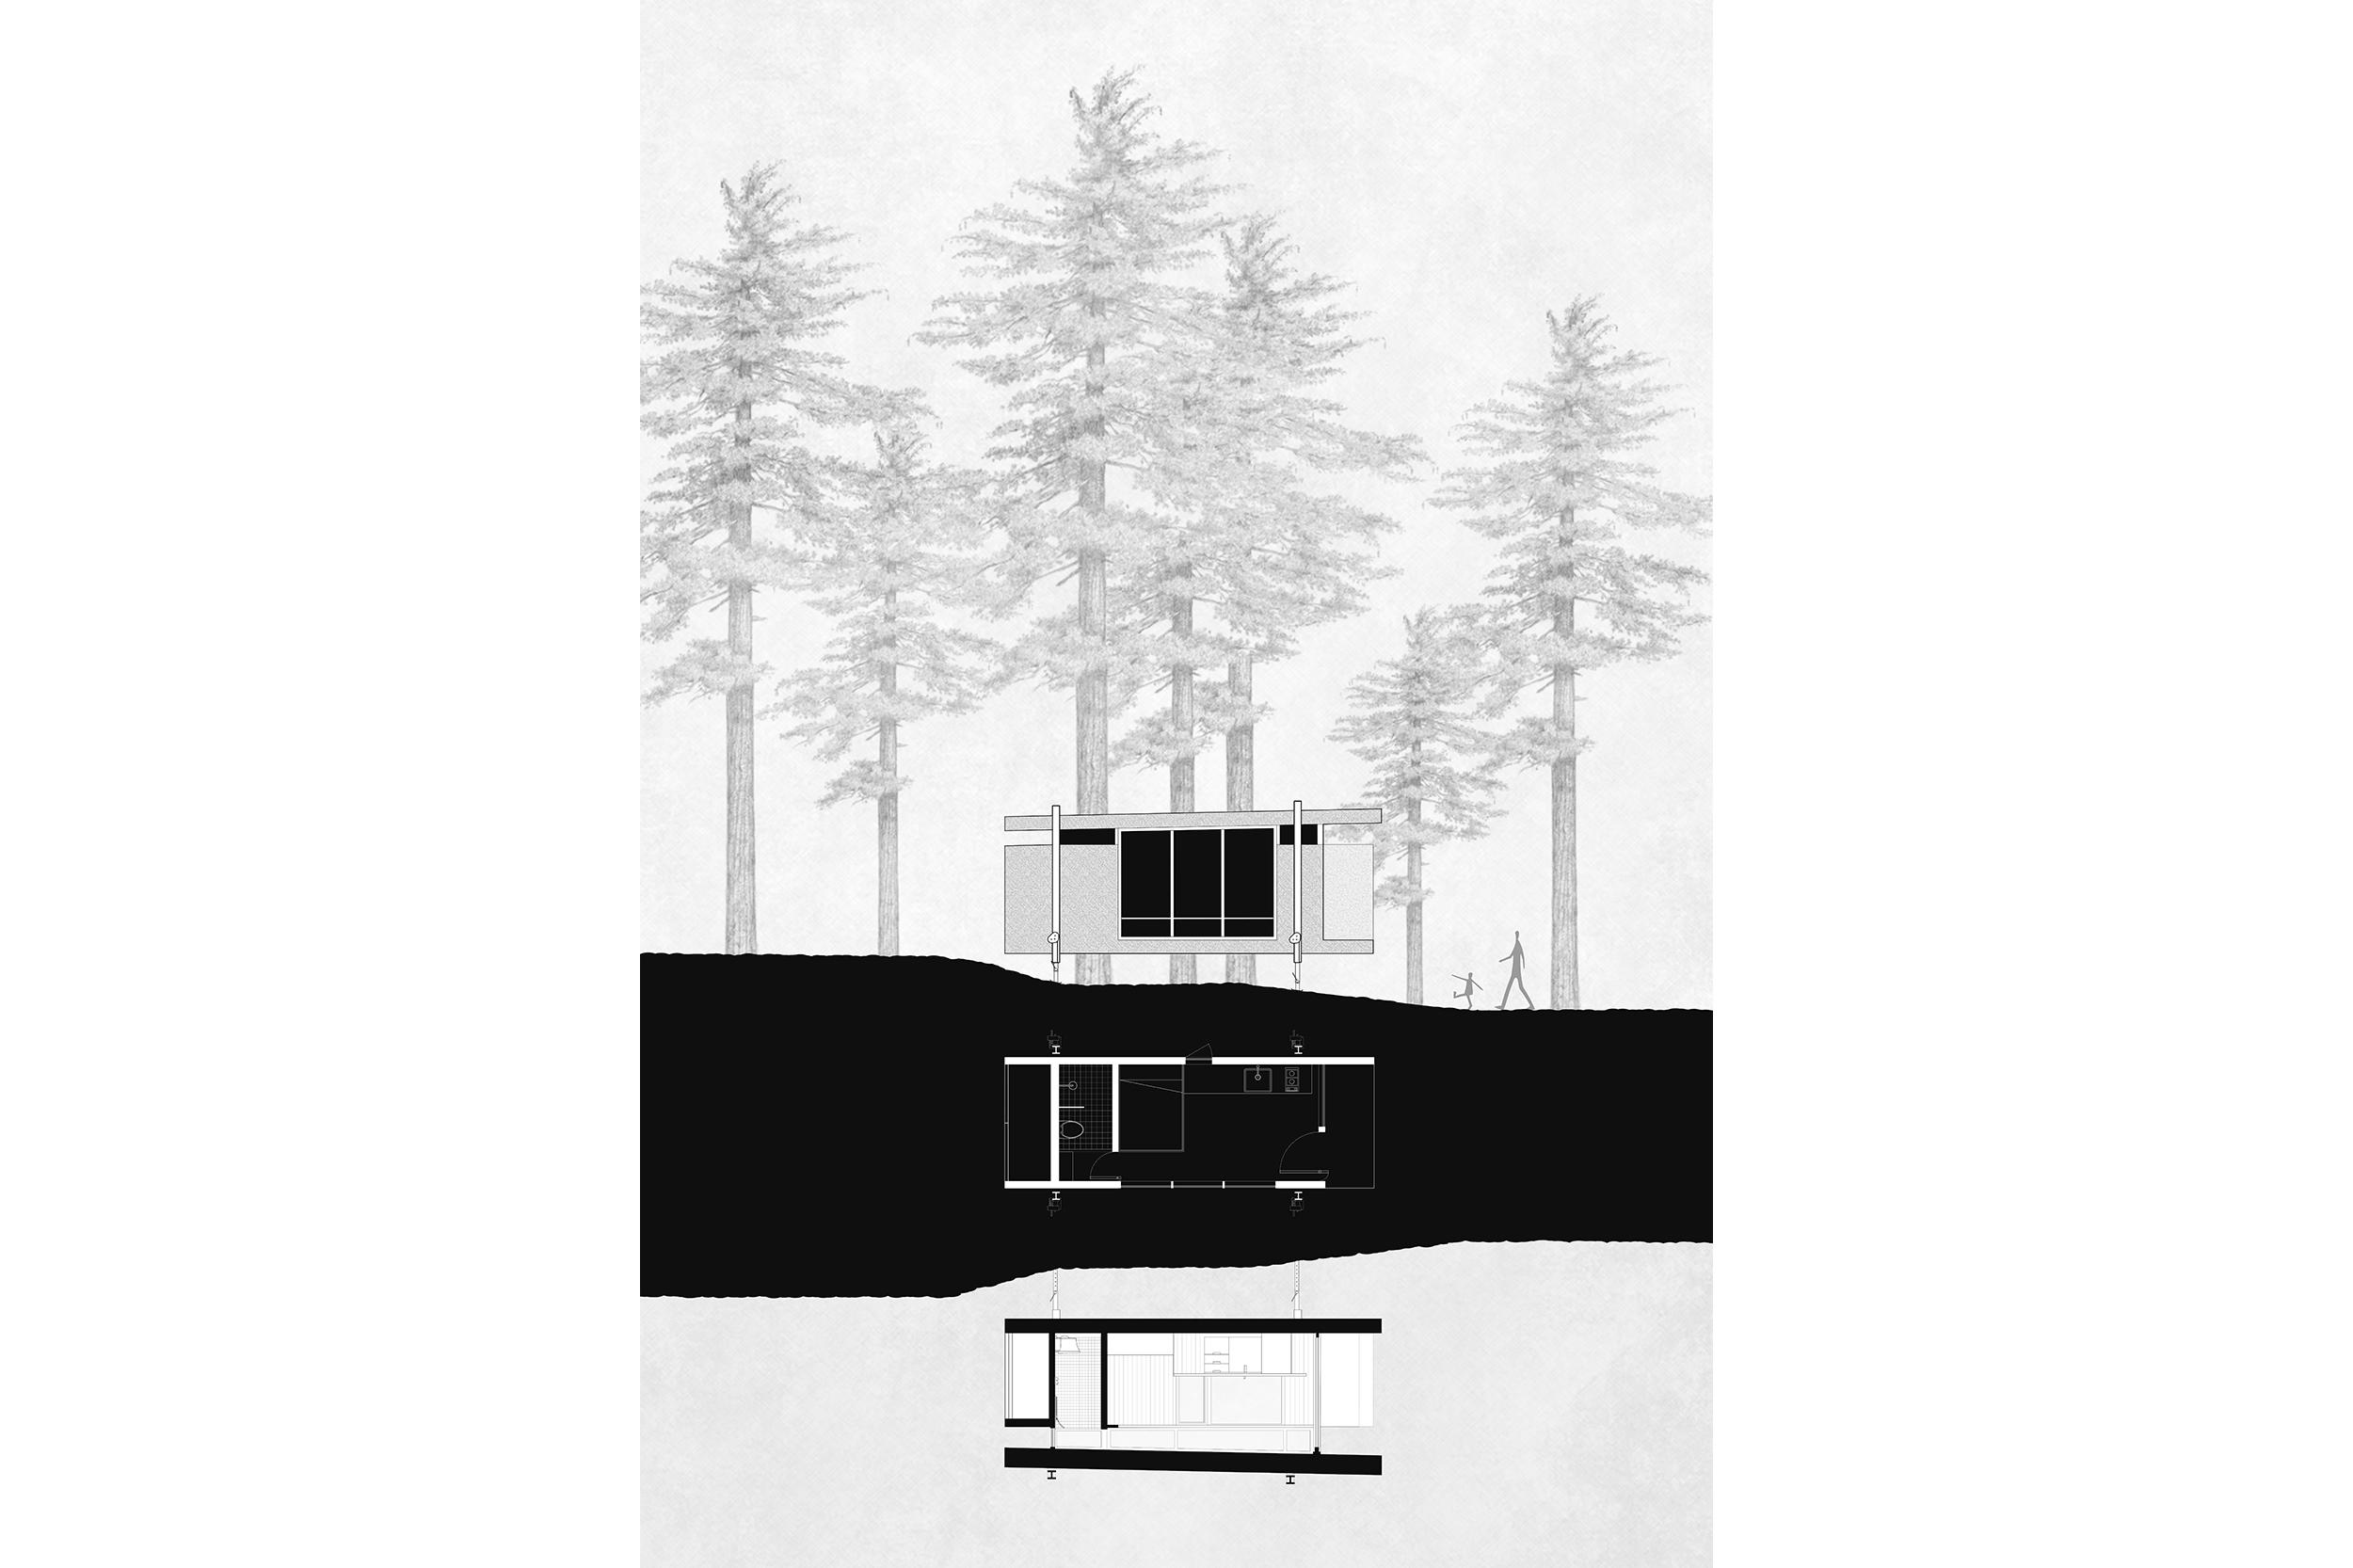 goCstudio_R6 Cabins_Elevation_Plan_Section.jpg